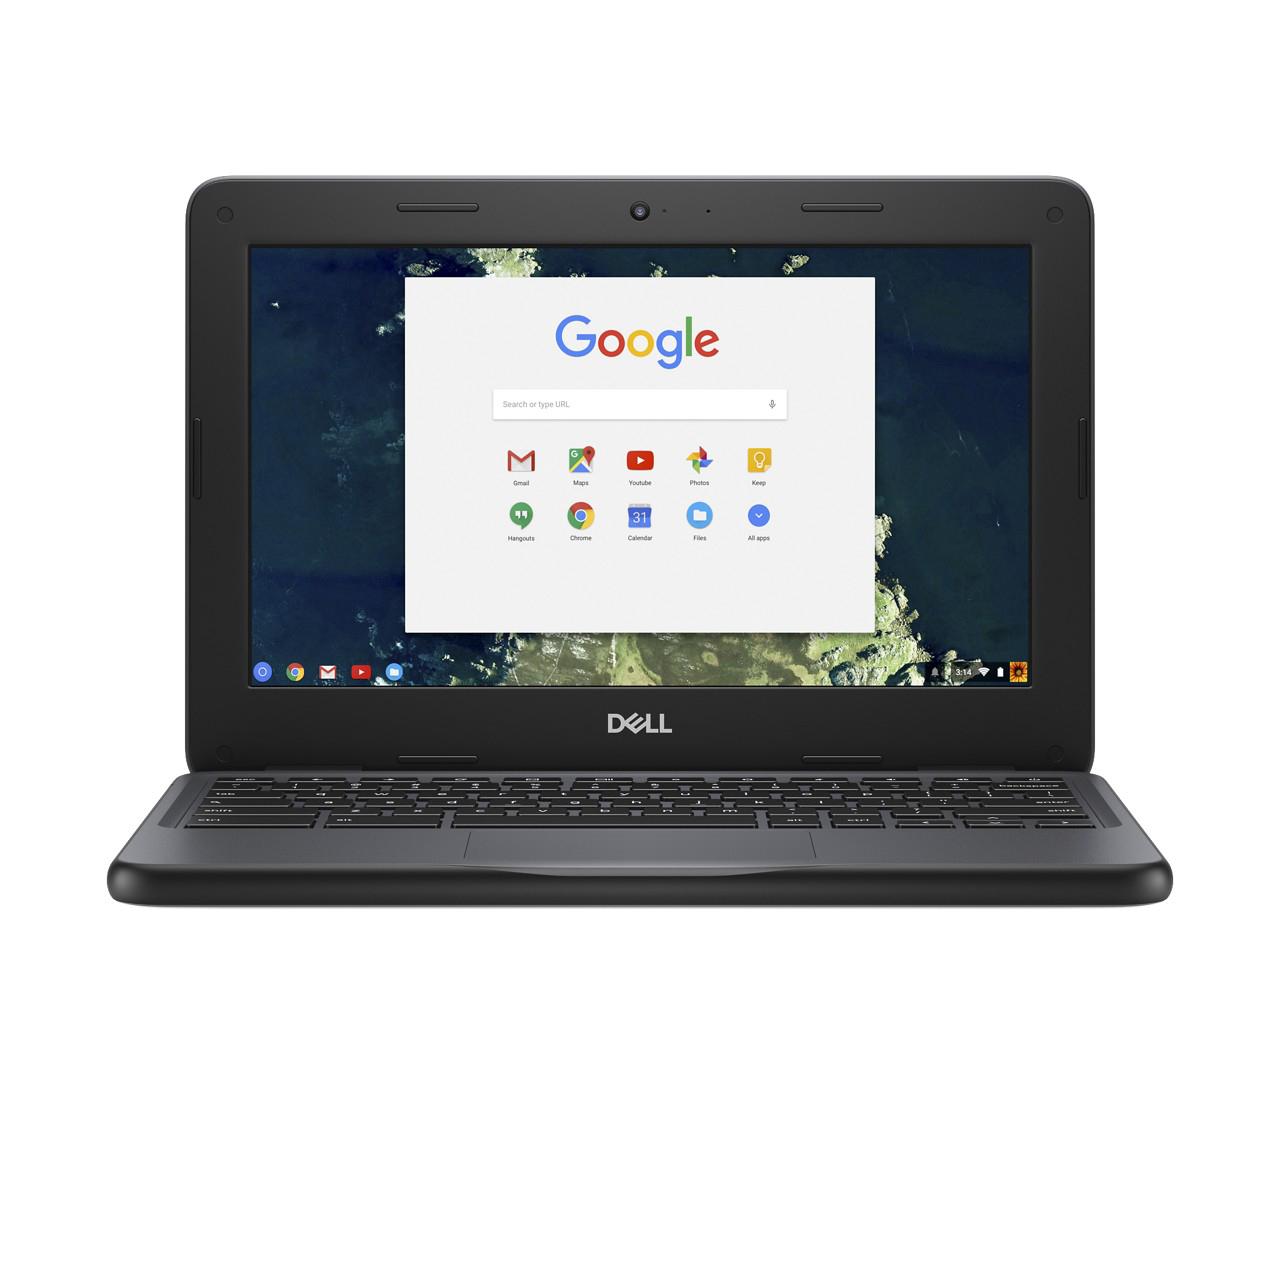 Dell Chromebook 3100 (nontouch)